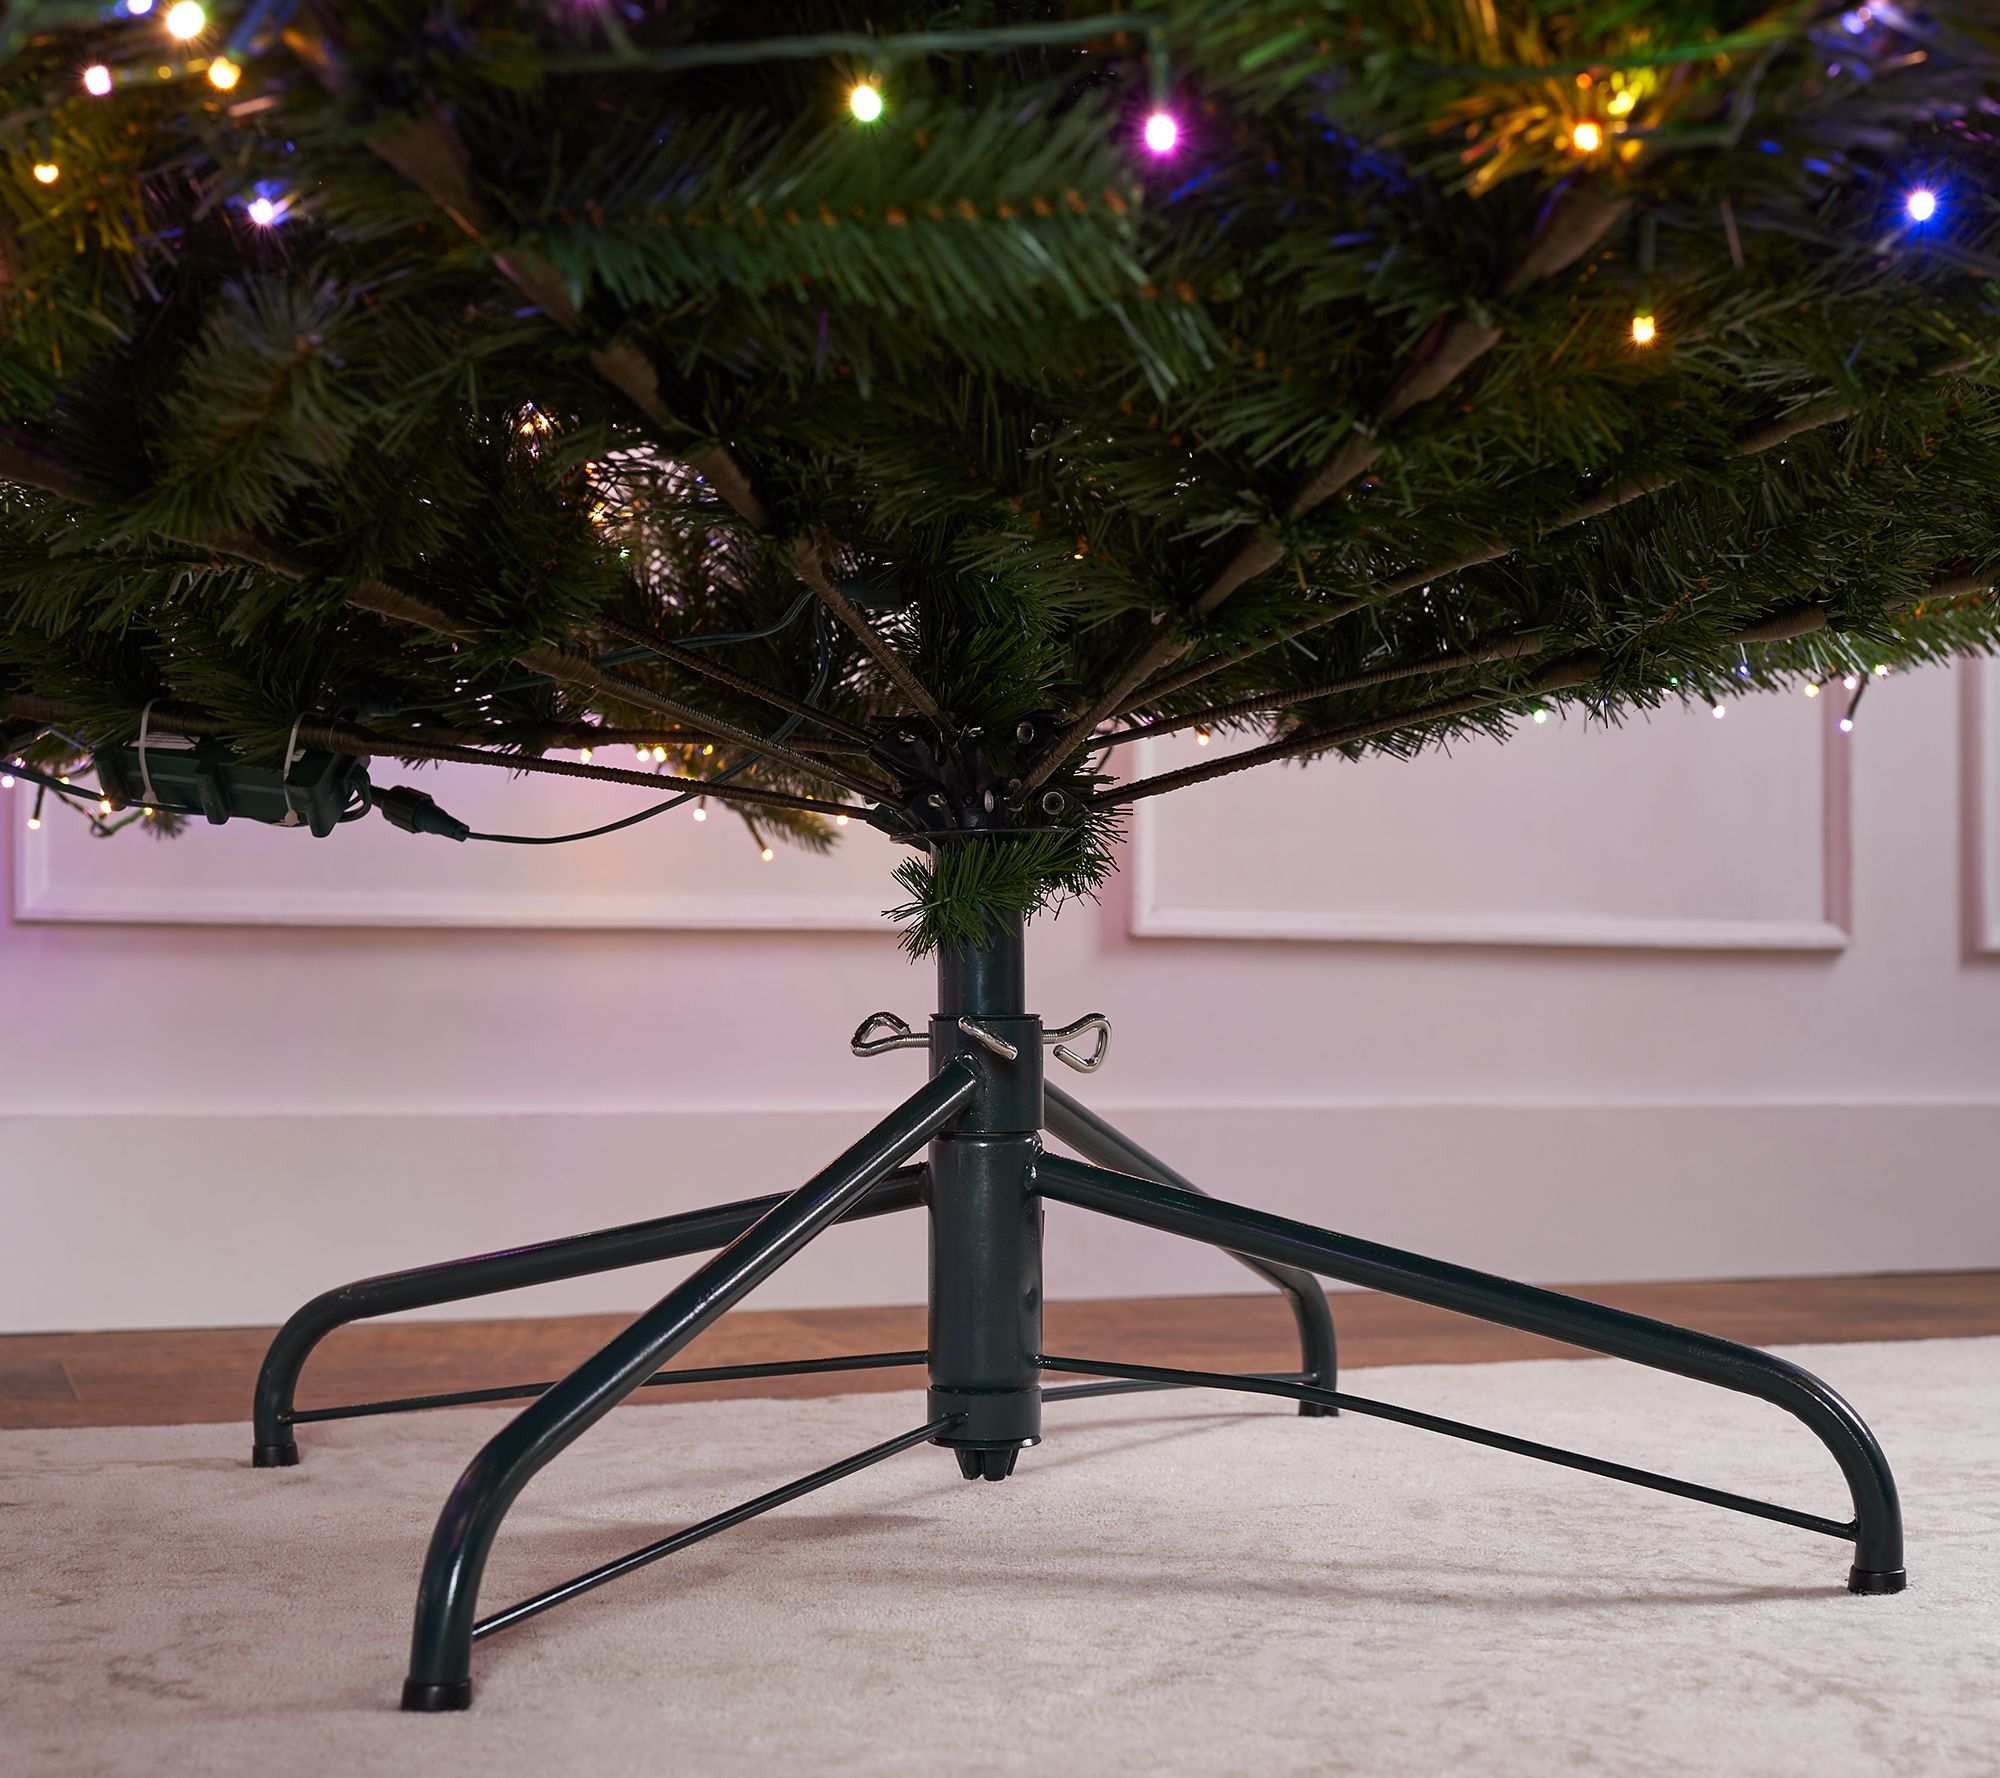 Santas Best Starry Light 9 Green Multi Function Microlight Tree Qvccom